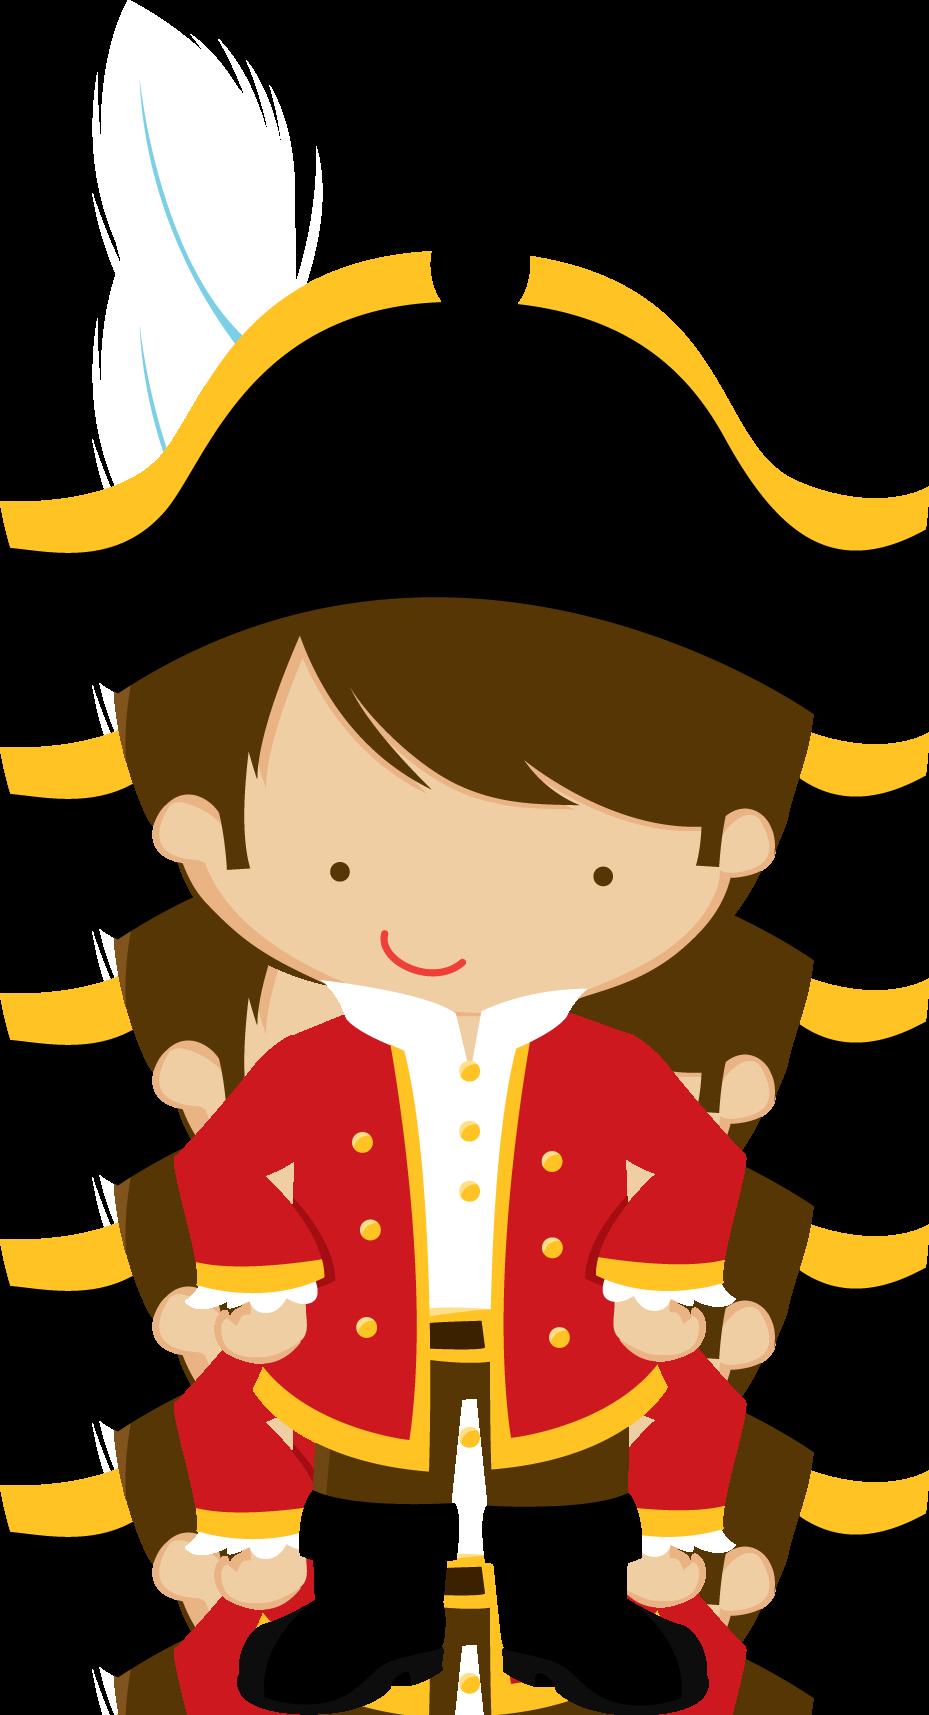 Halloween pirate clipart vector freeuse library Capitan Pirata | Guerreros cumple infantil | Pinterest | Clip art ... vector freeuse library